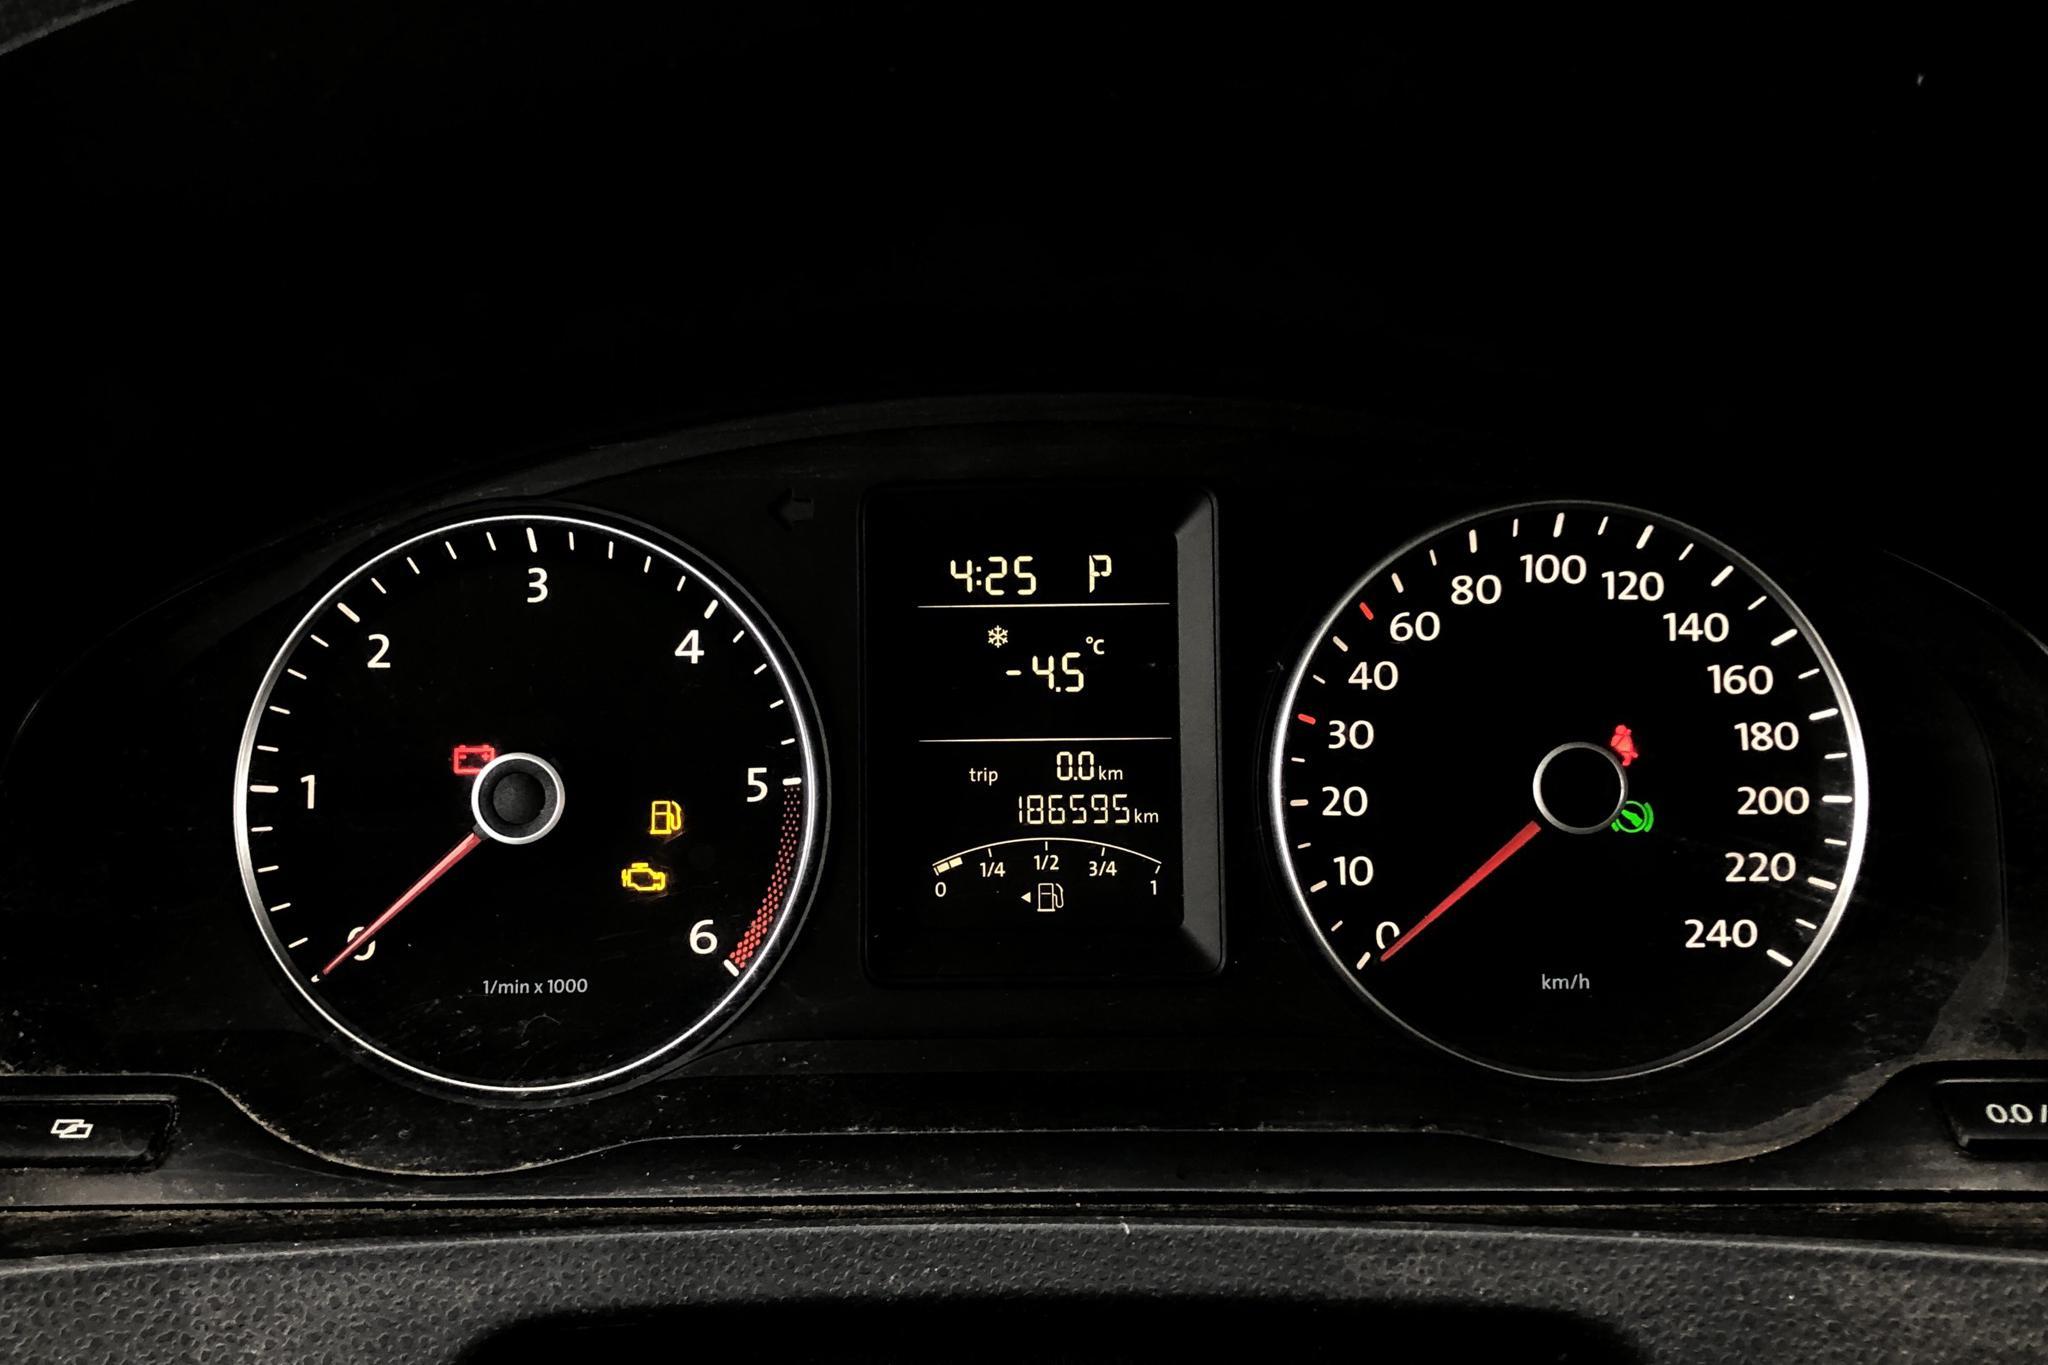 VW Transporter T5 2.0 TDI (140hk) - 18 659 mil - Automat - silver - 2011